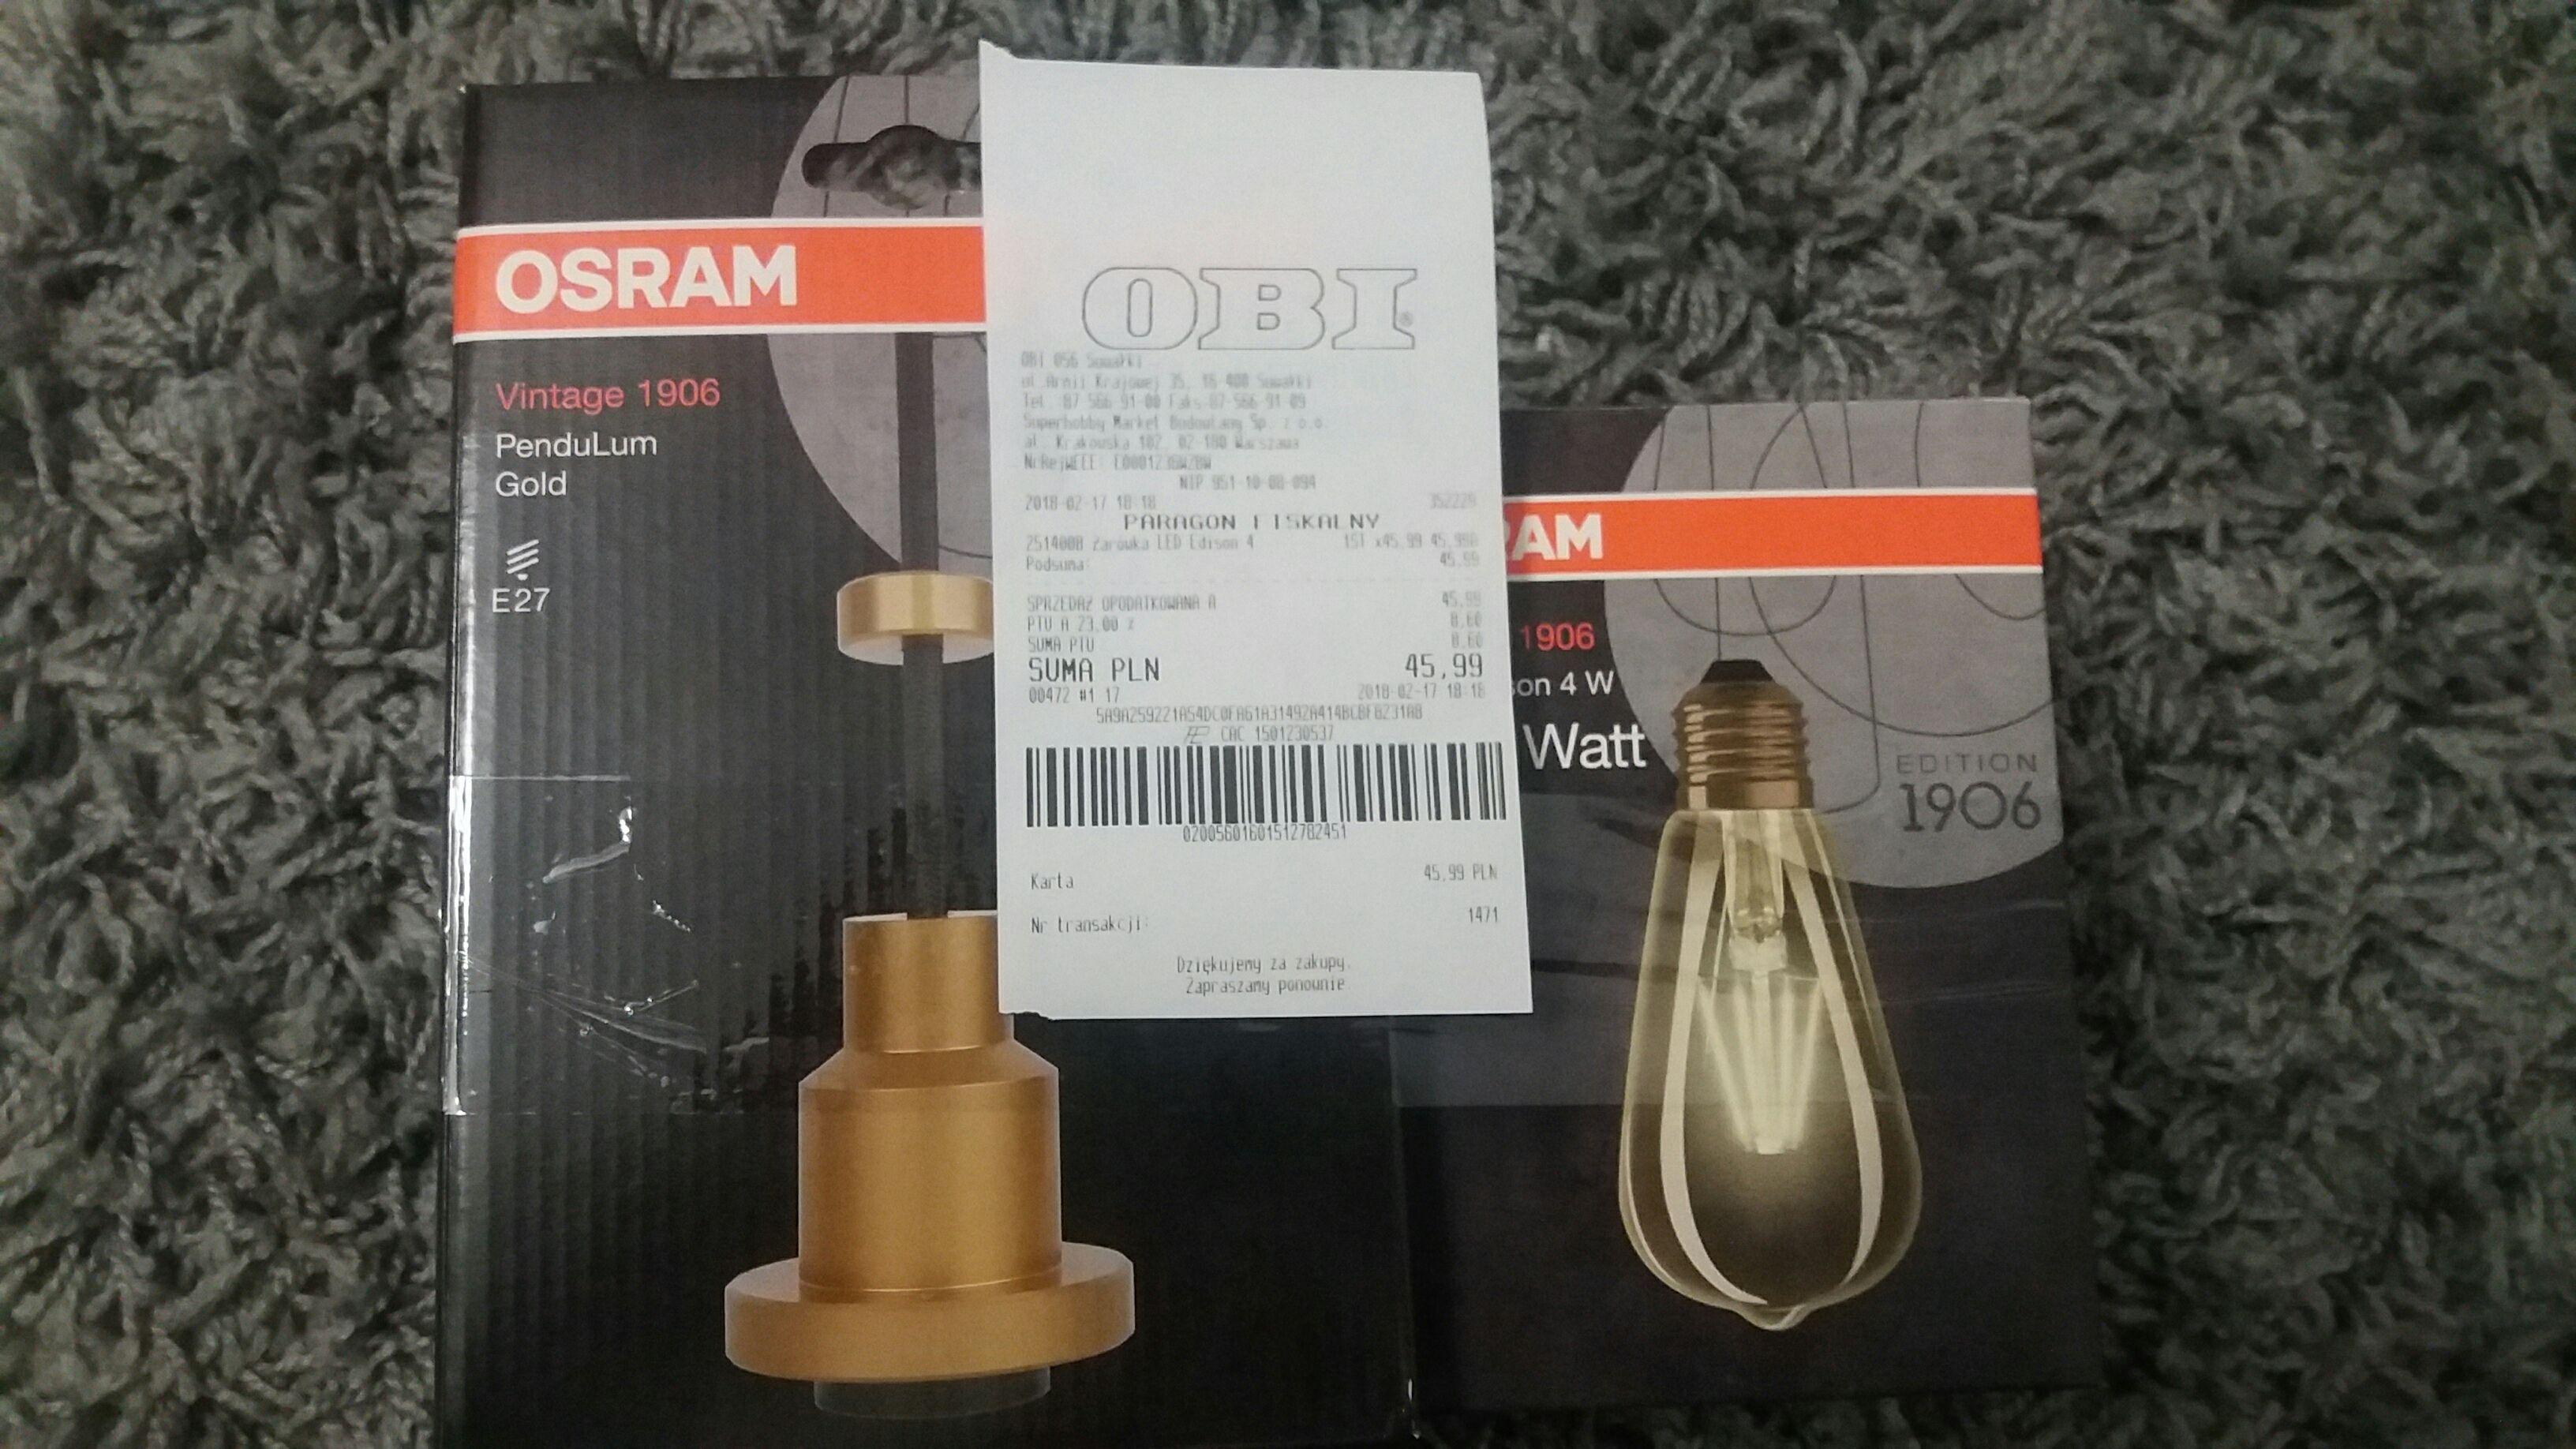 Obi e27 led + oprawa gratis OSRAM